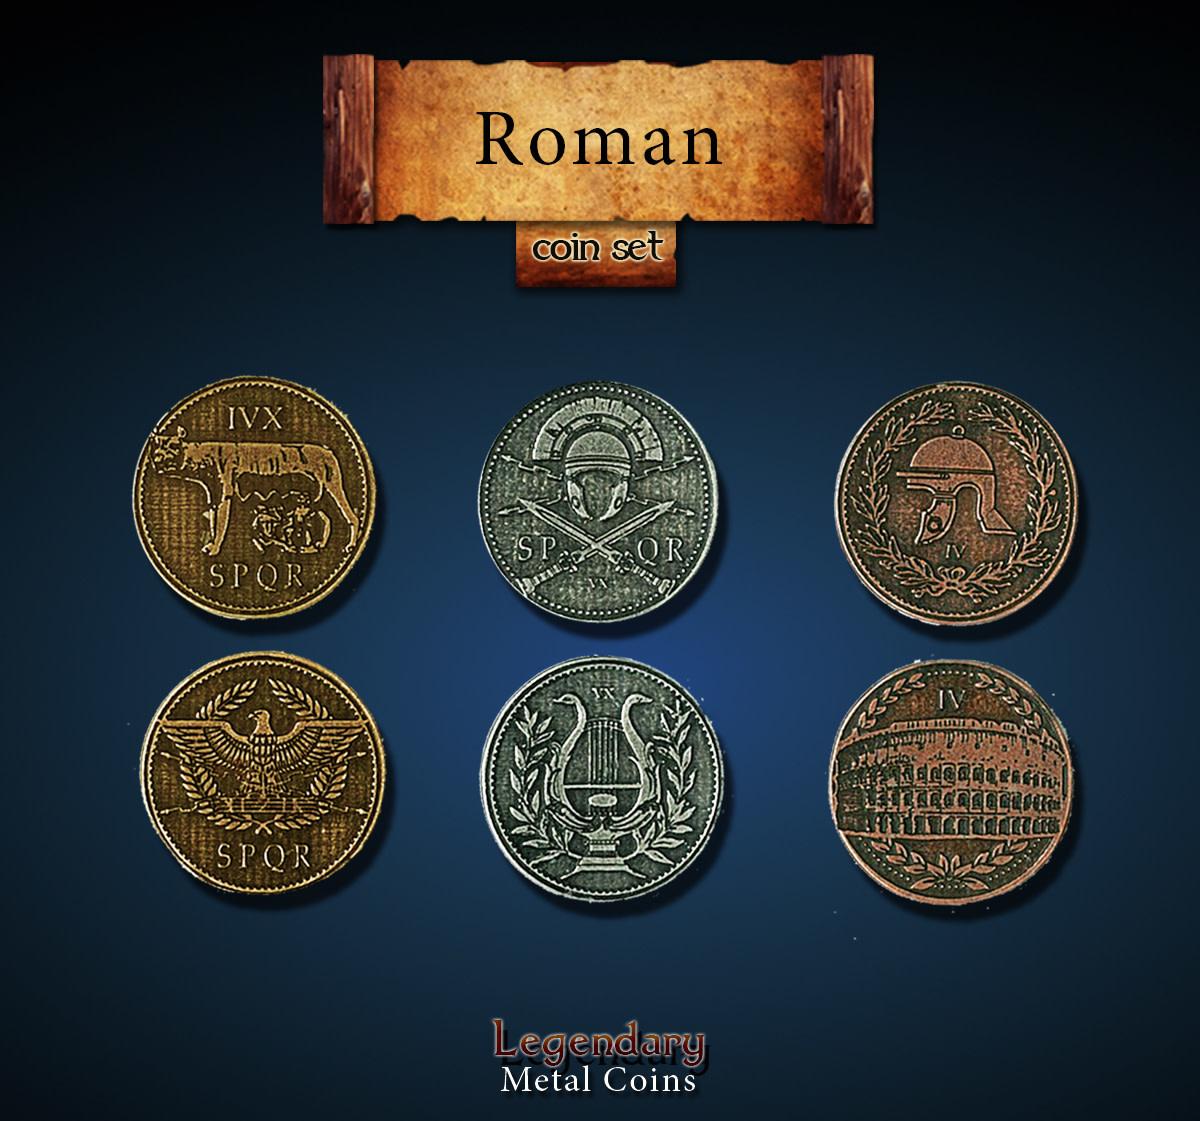 Legendary Metal Coins: Roman (24pcs)